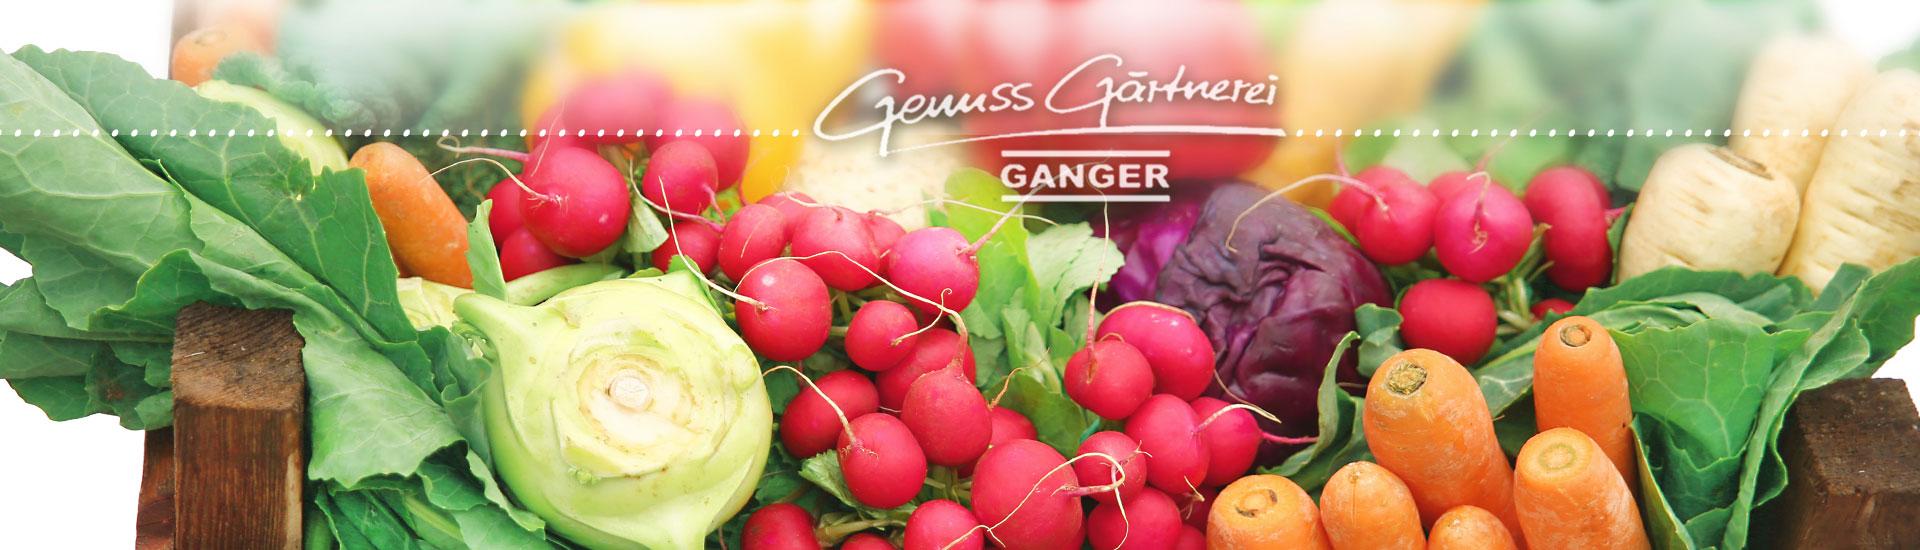 Gärtnerei Ganger | Gemüse